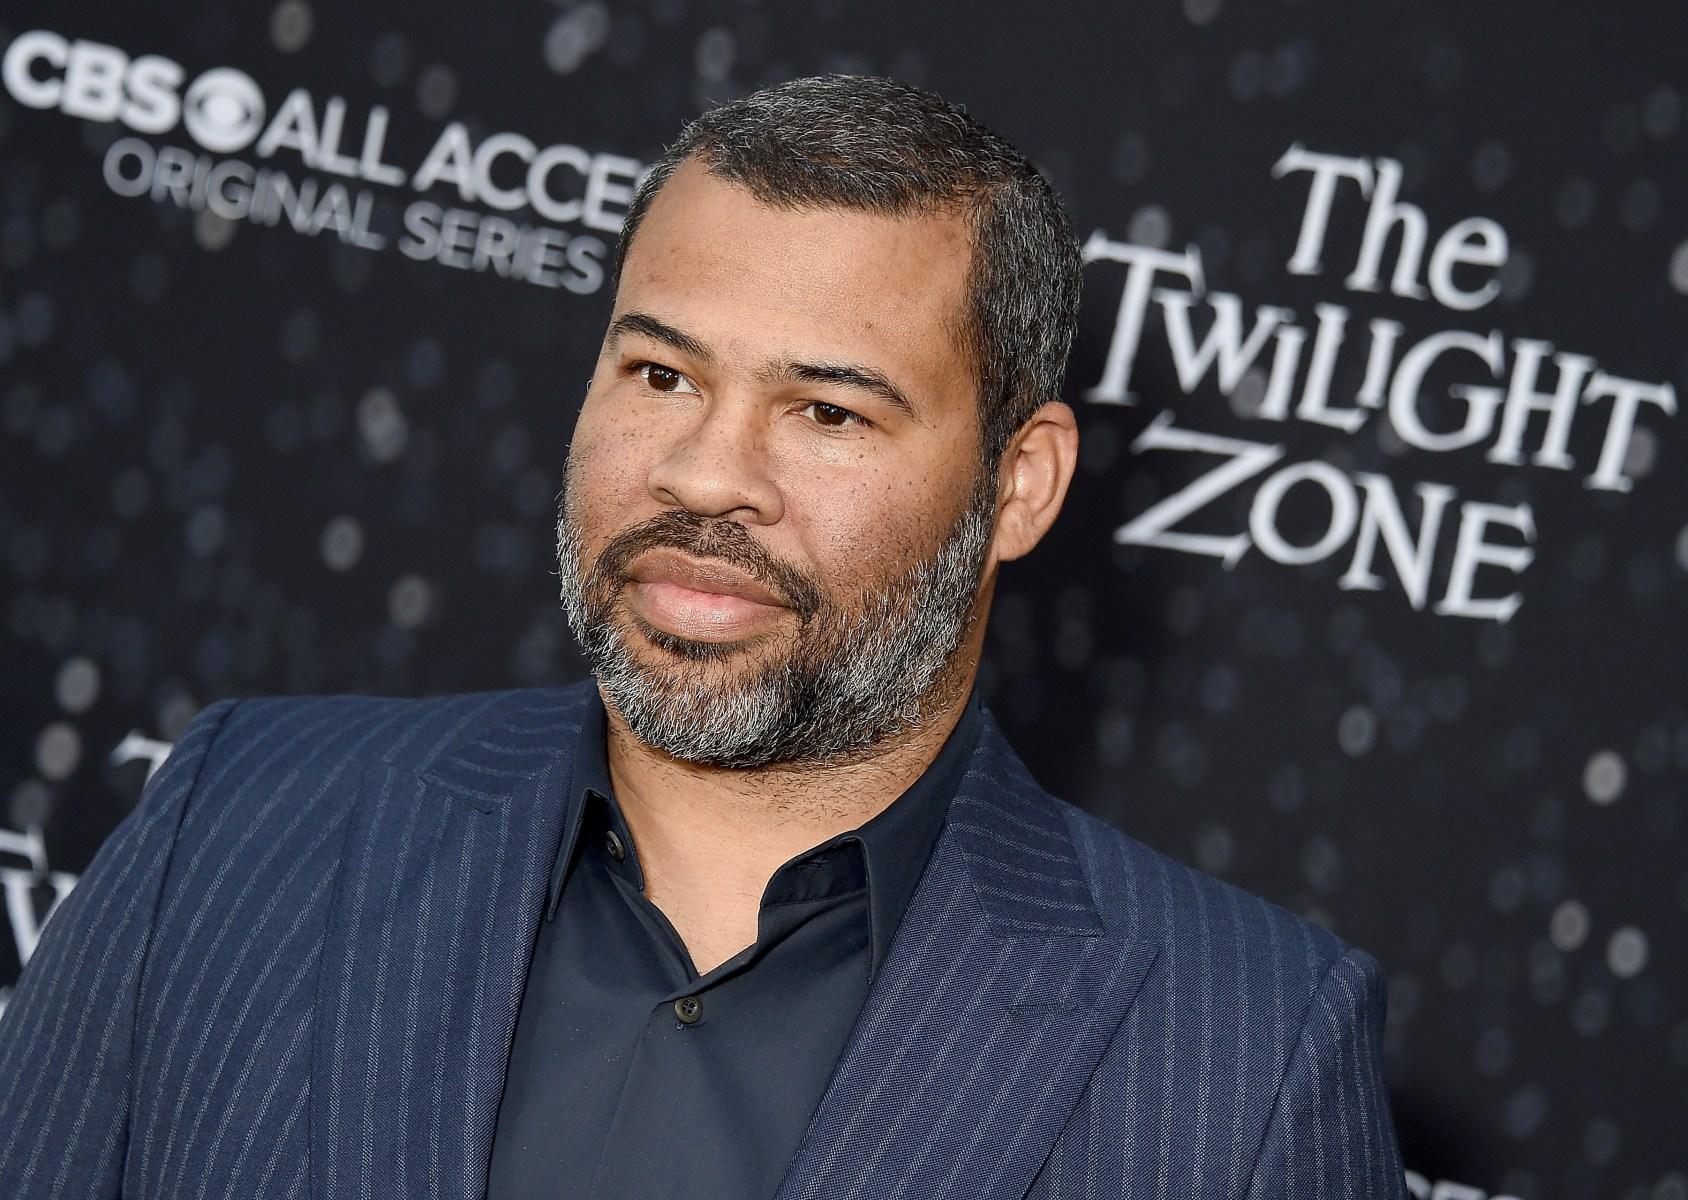 Jordan peele's twilight zone